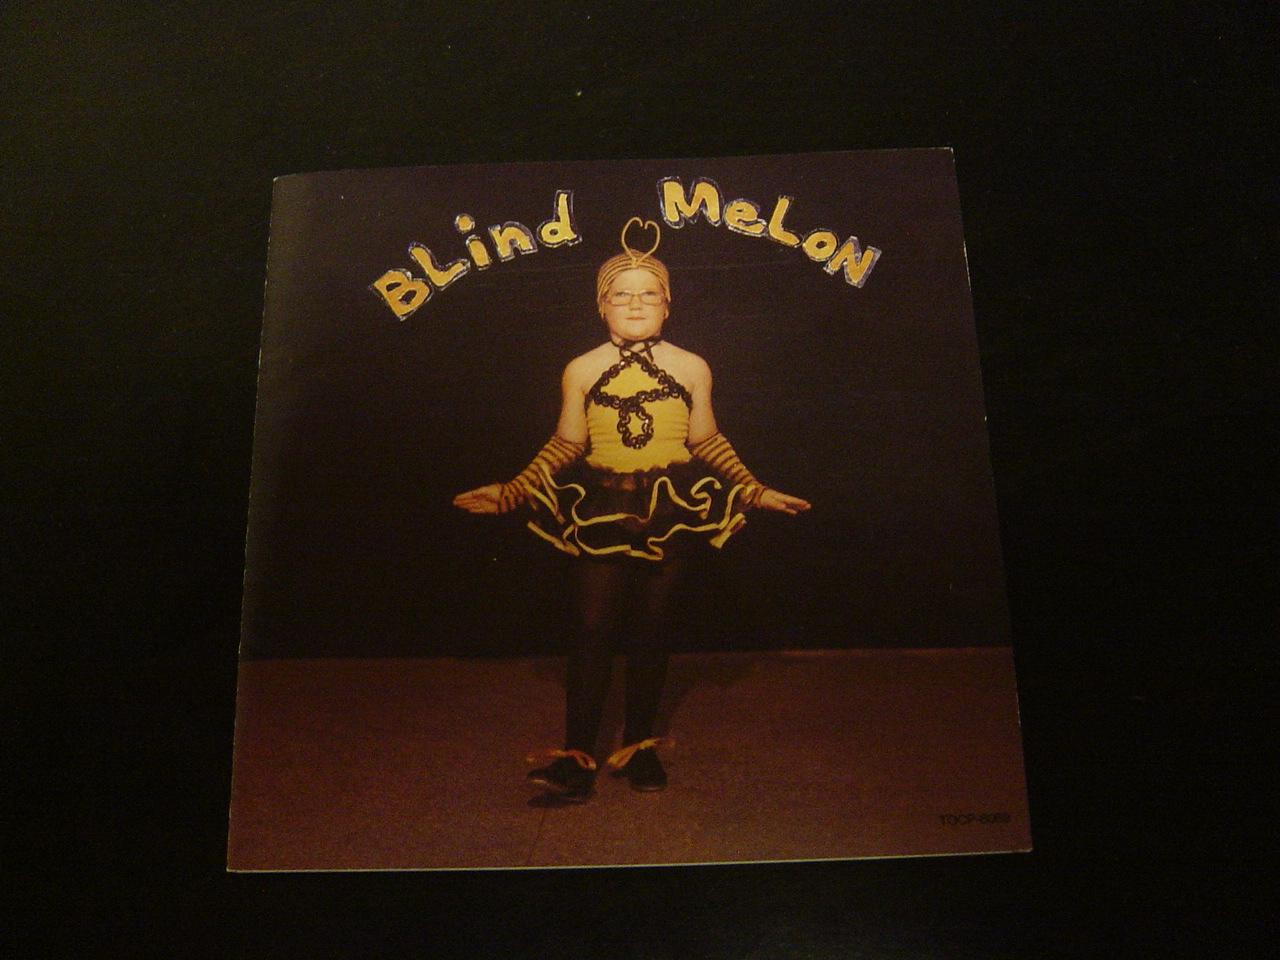 Blind_melon